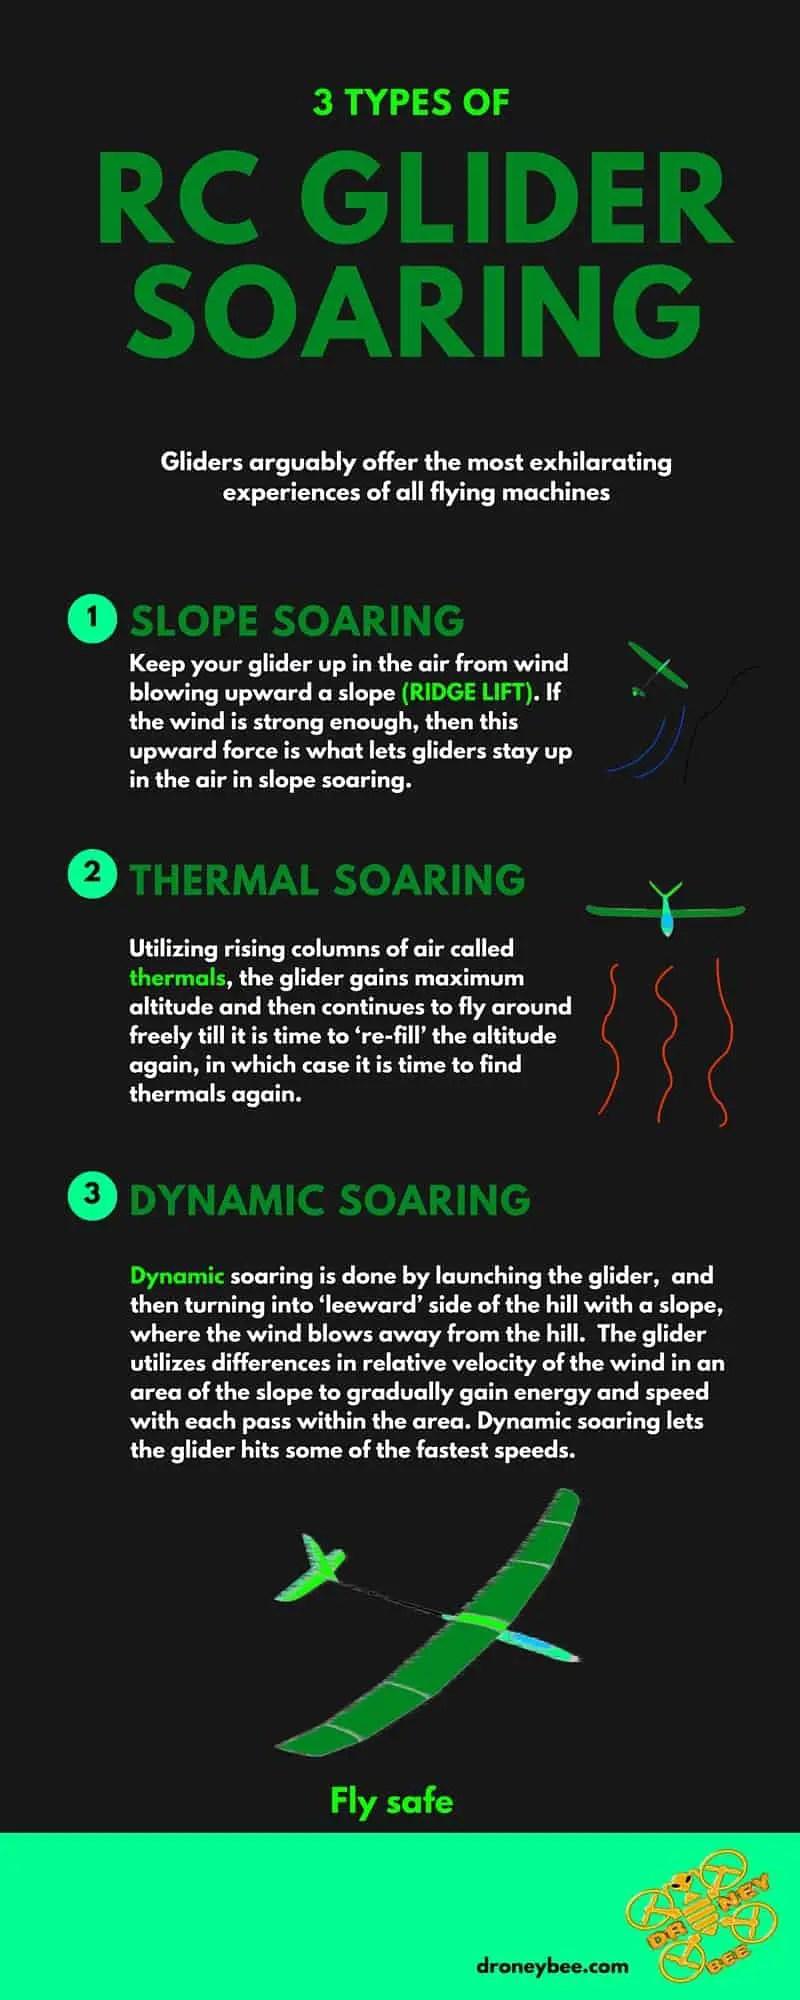 RC sailplane soaring : Infographic